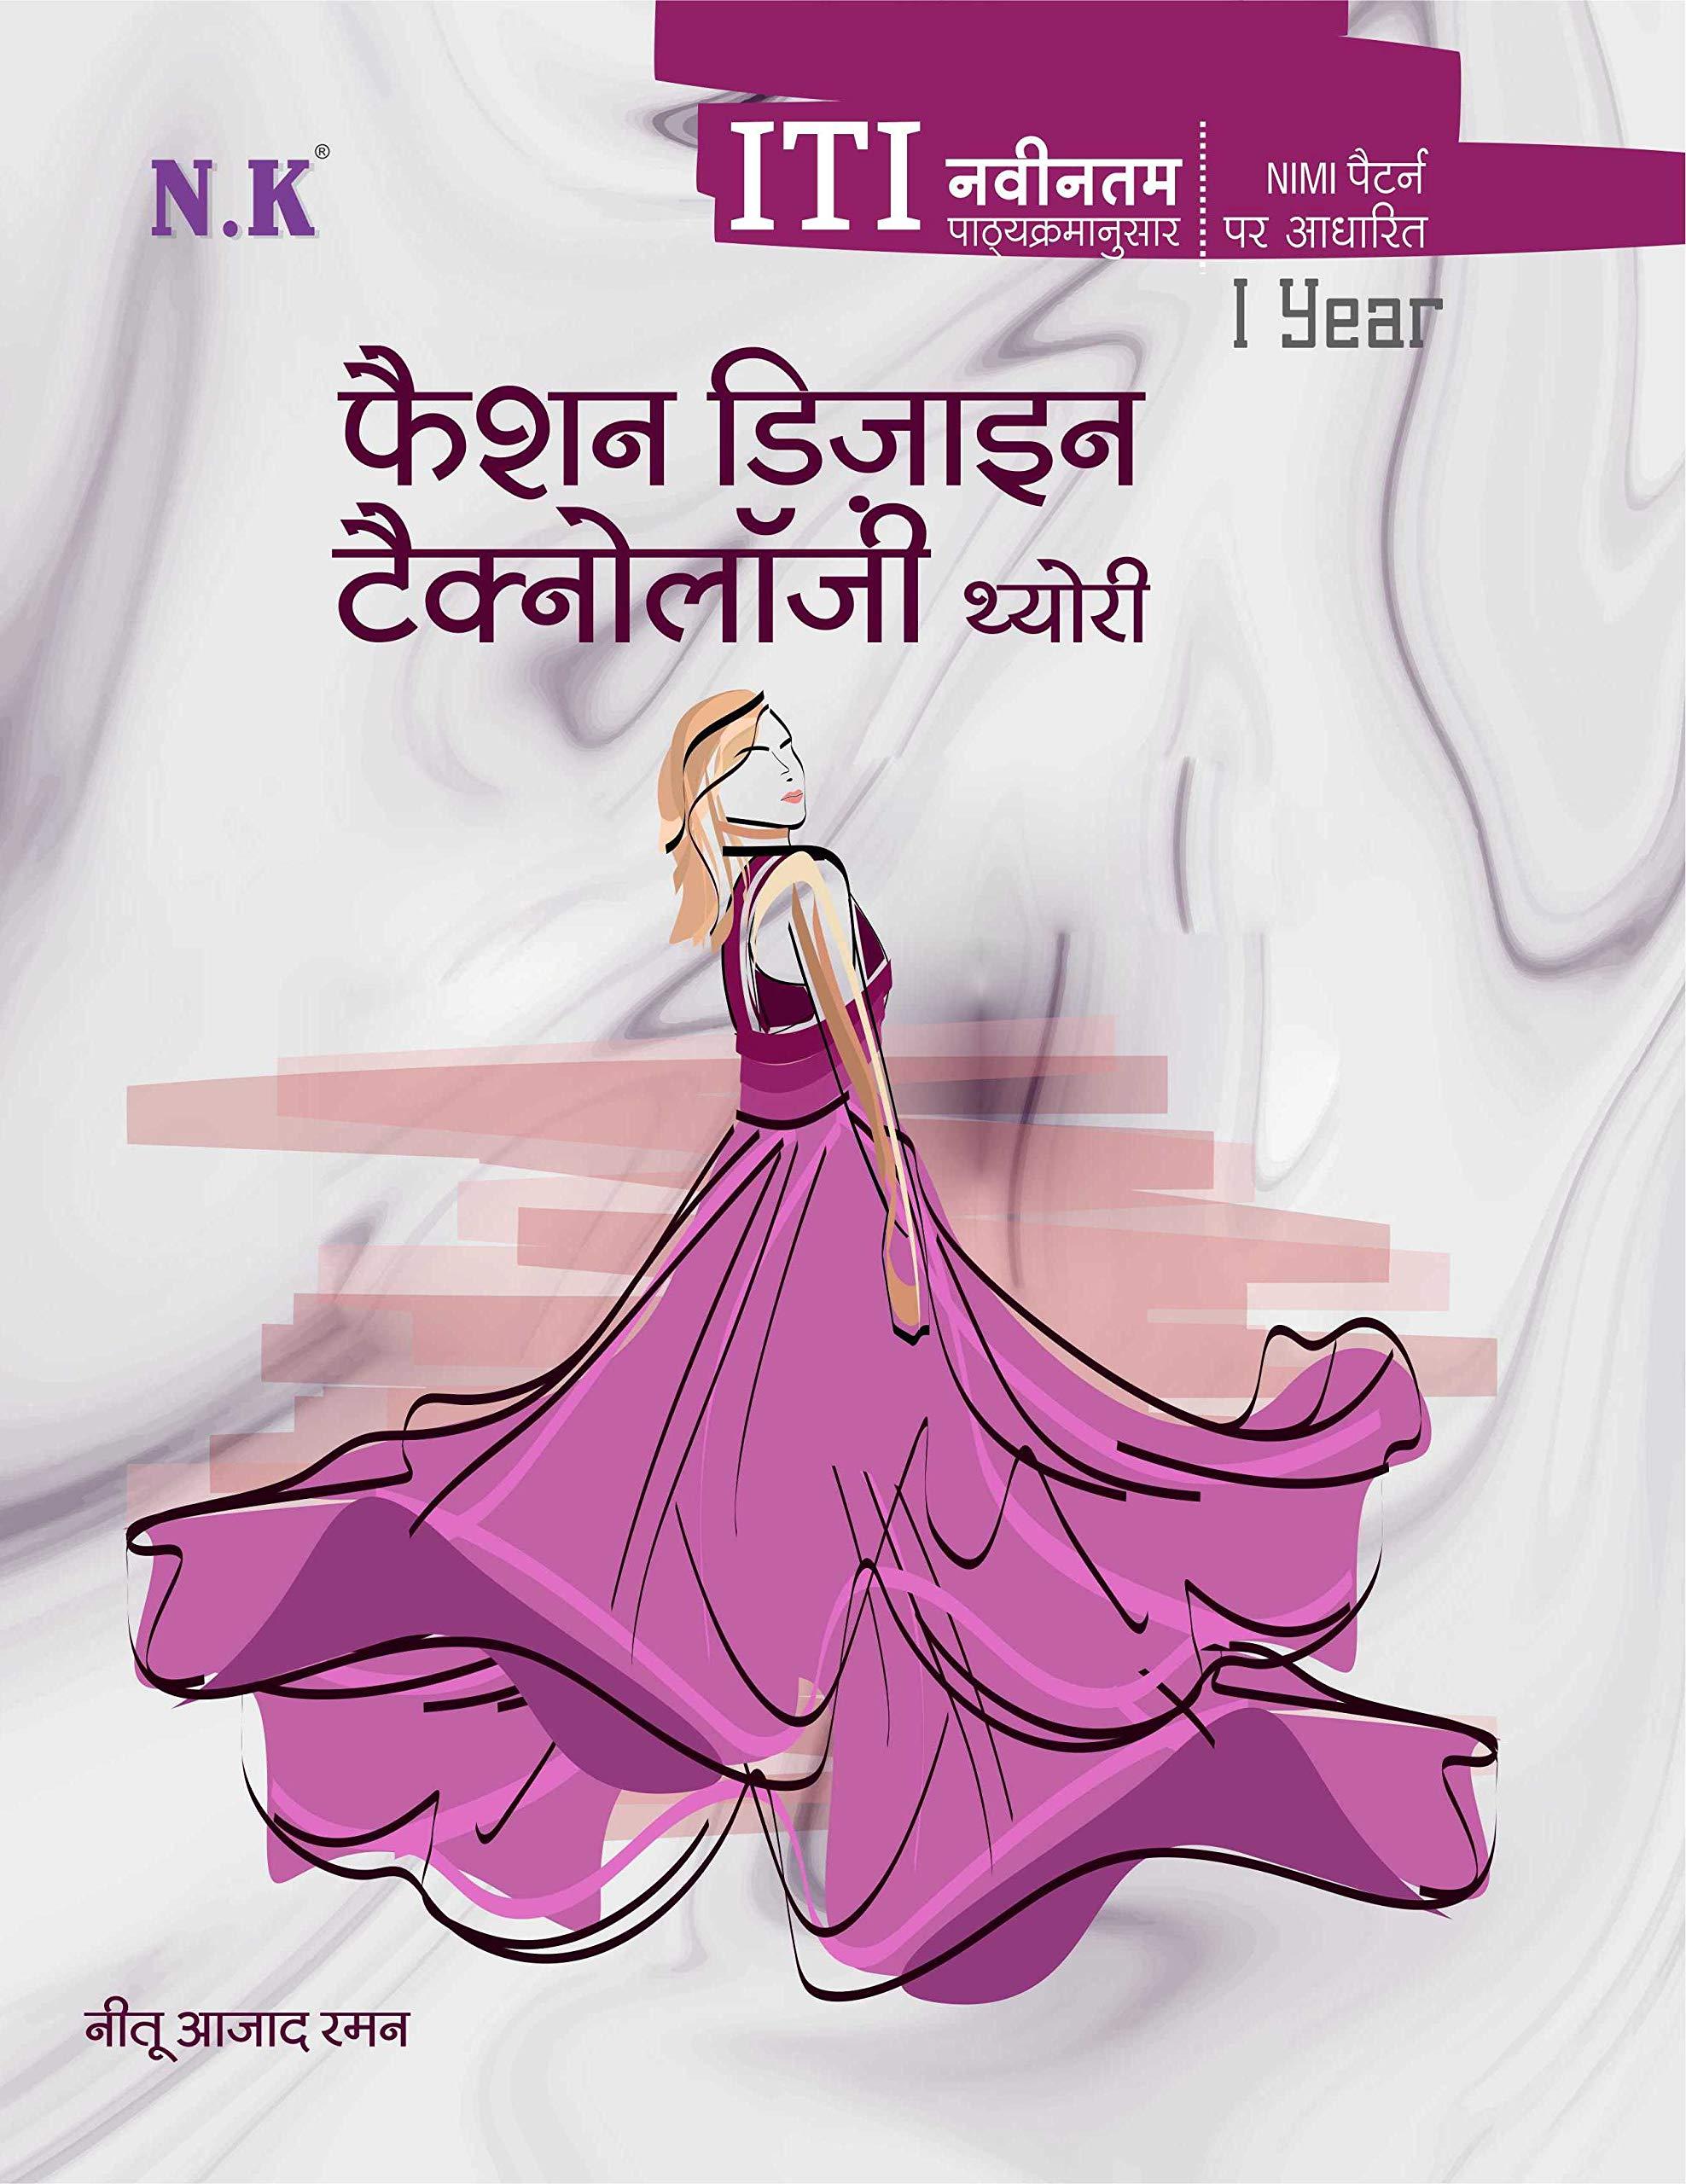 fashion design books for fashion students the best design books ITI Fashion Design Technology Theory for ITI 1st Year Exam by Neetu Azad  Raman in Hindi Medium